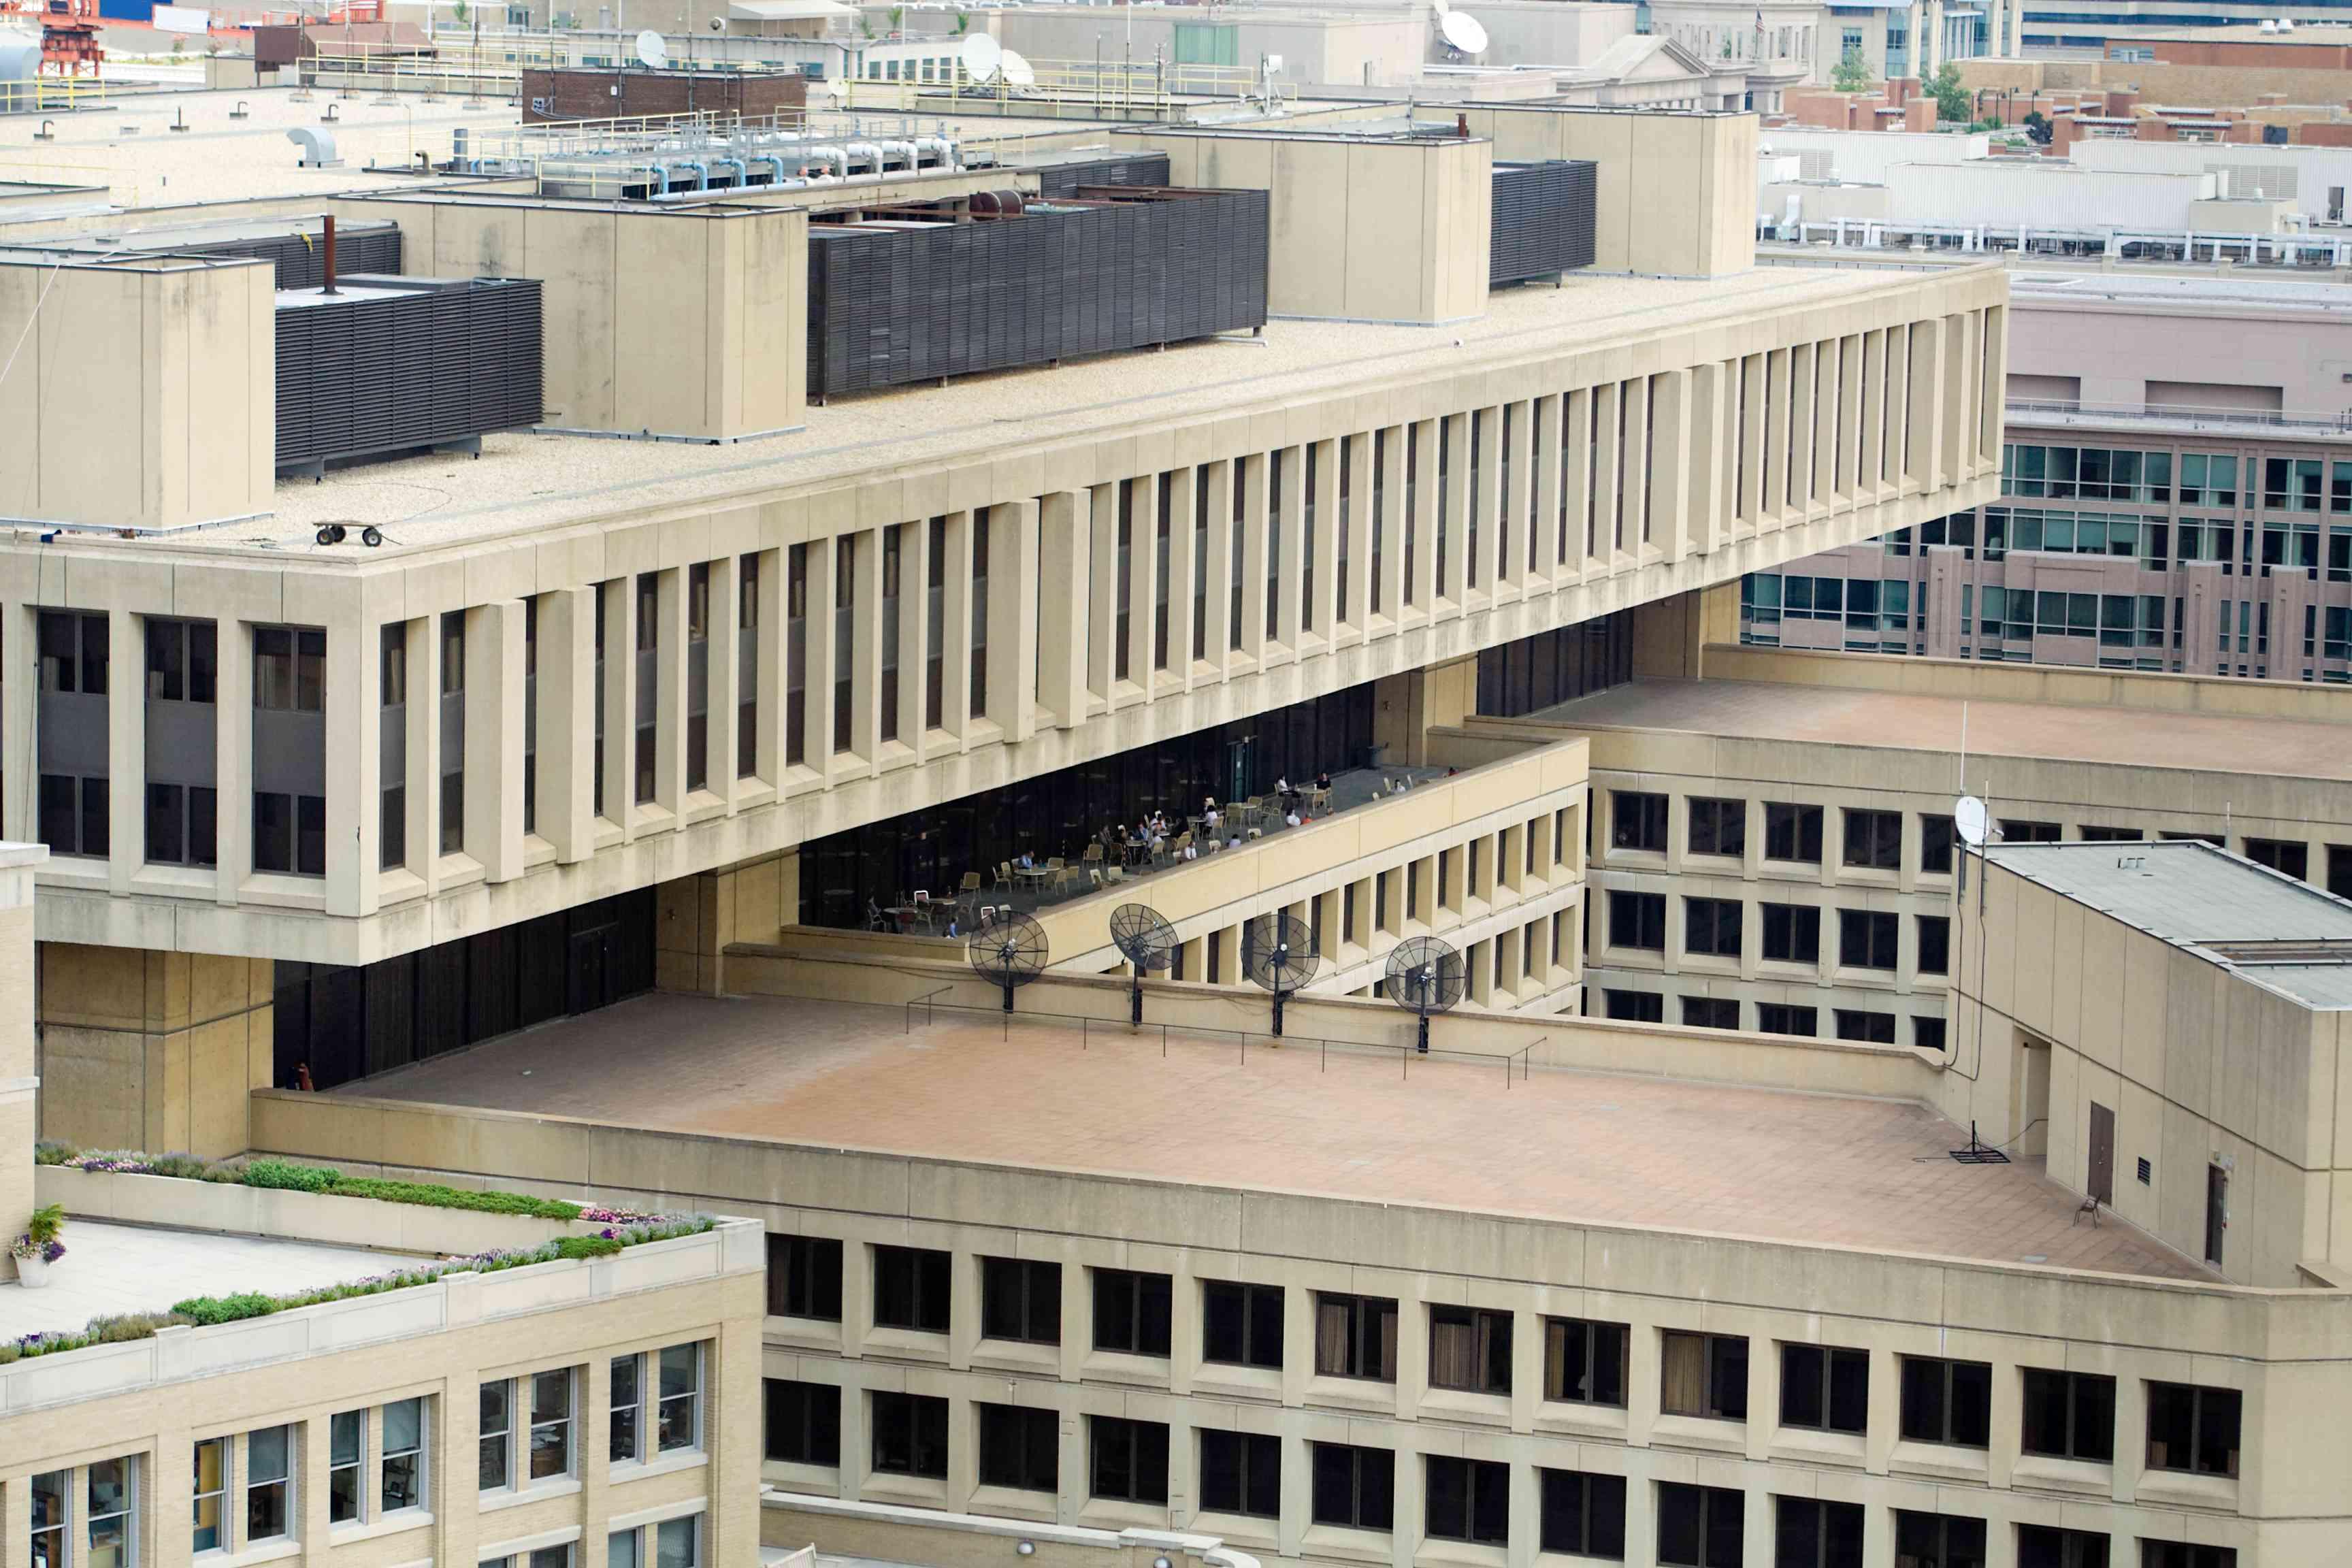 J Edgar Hoover FBI Building, Washington, DC